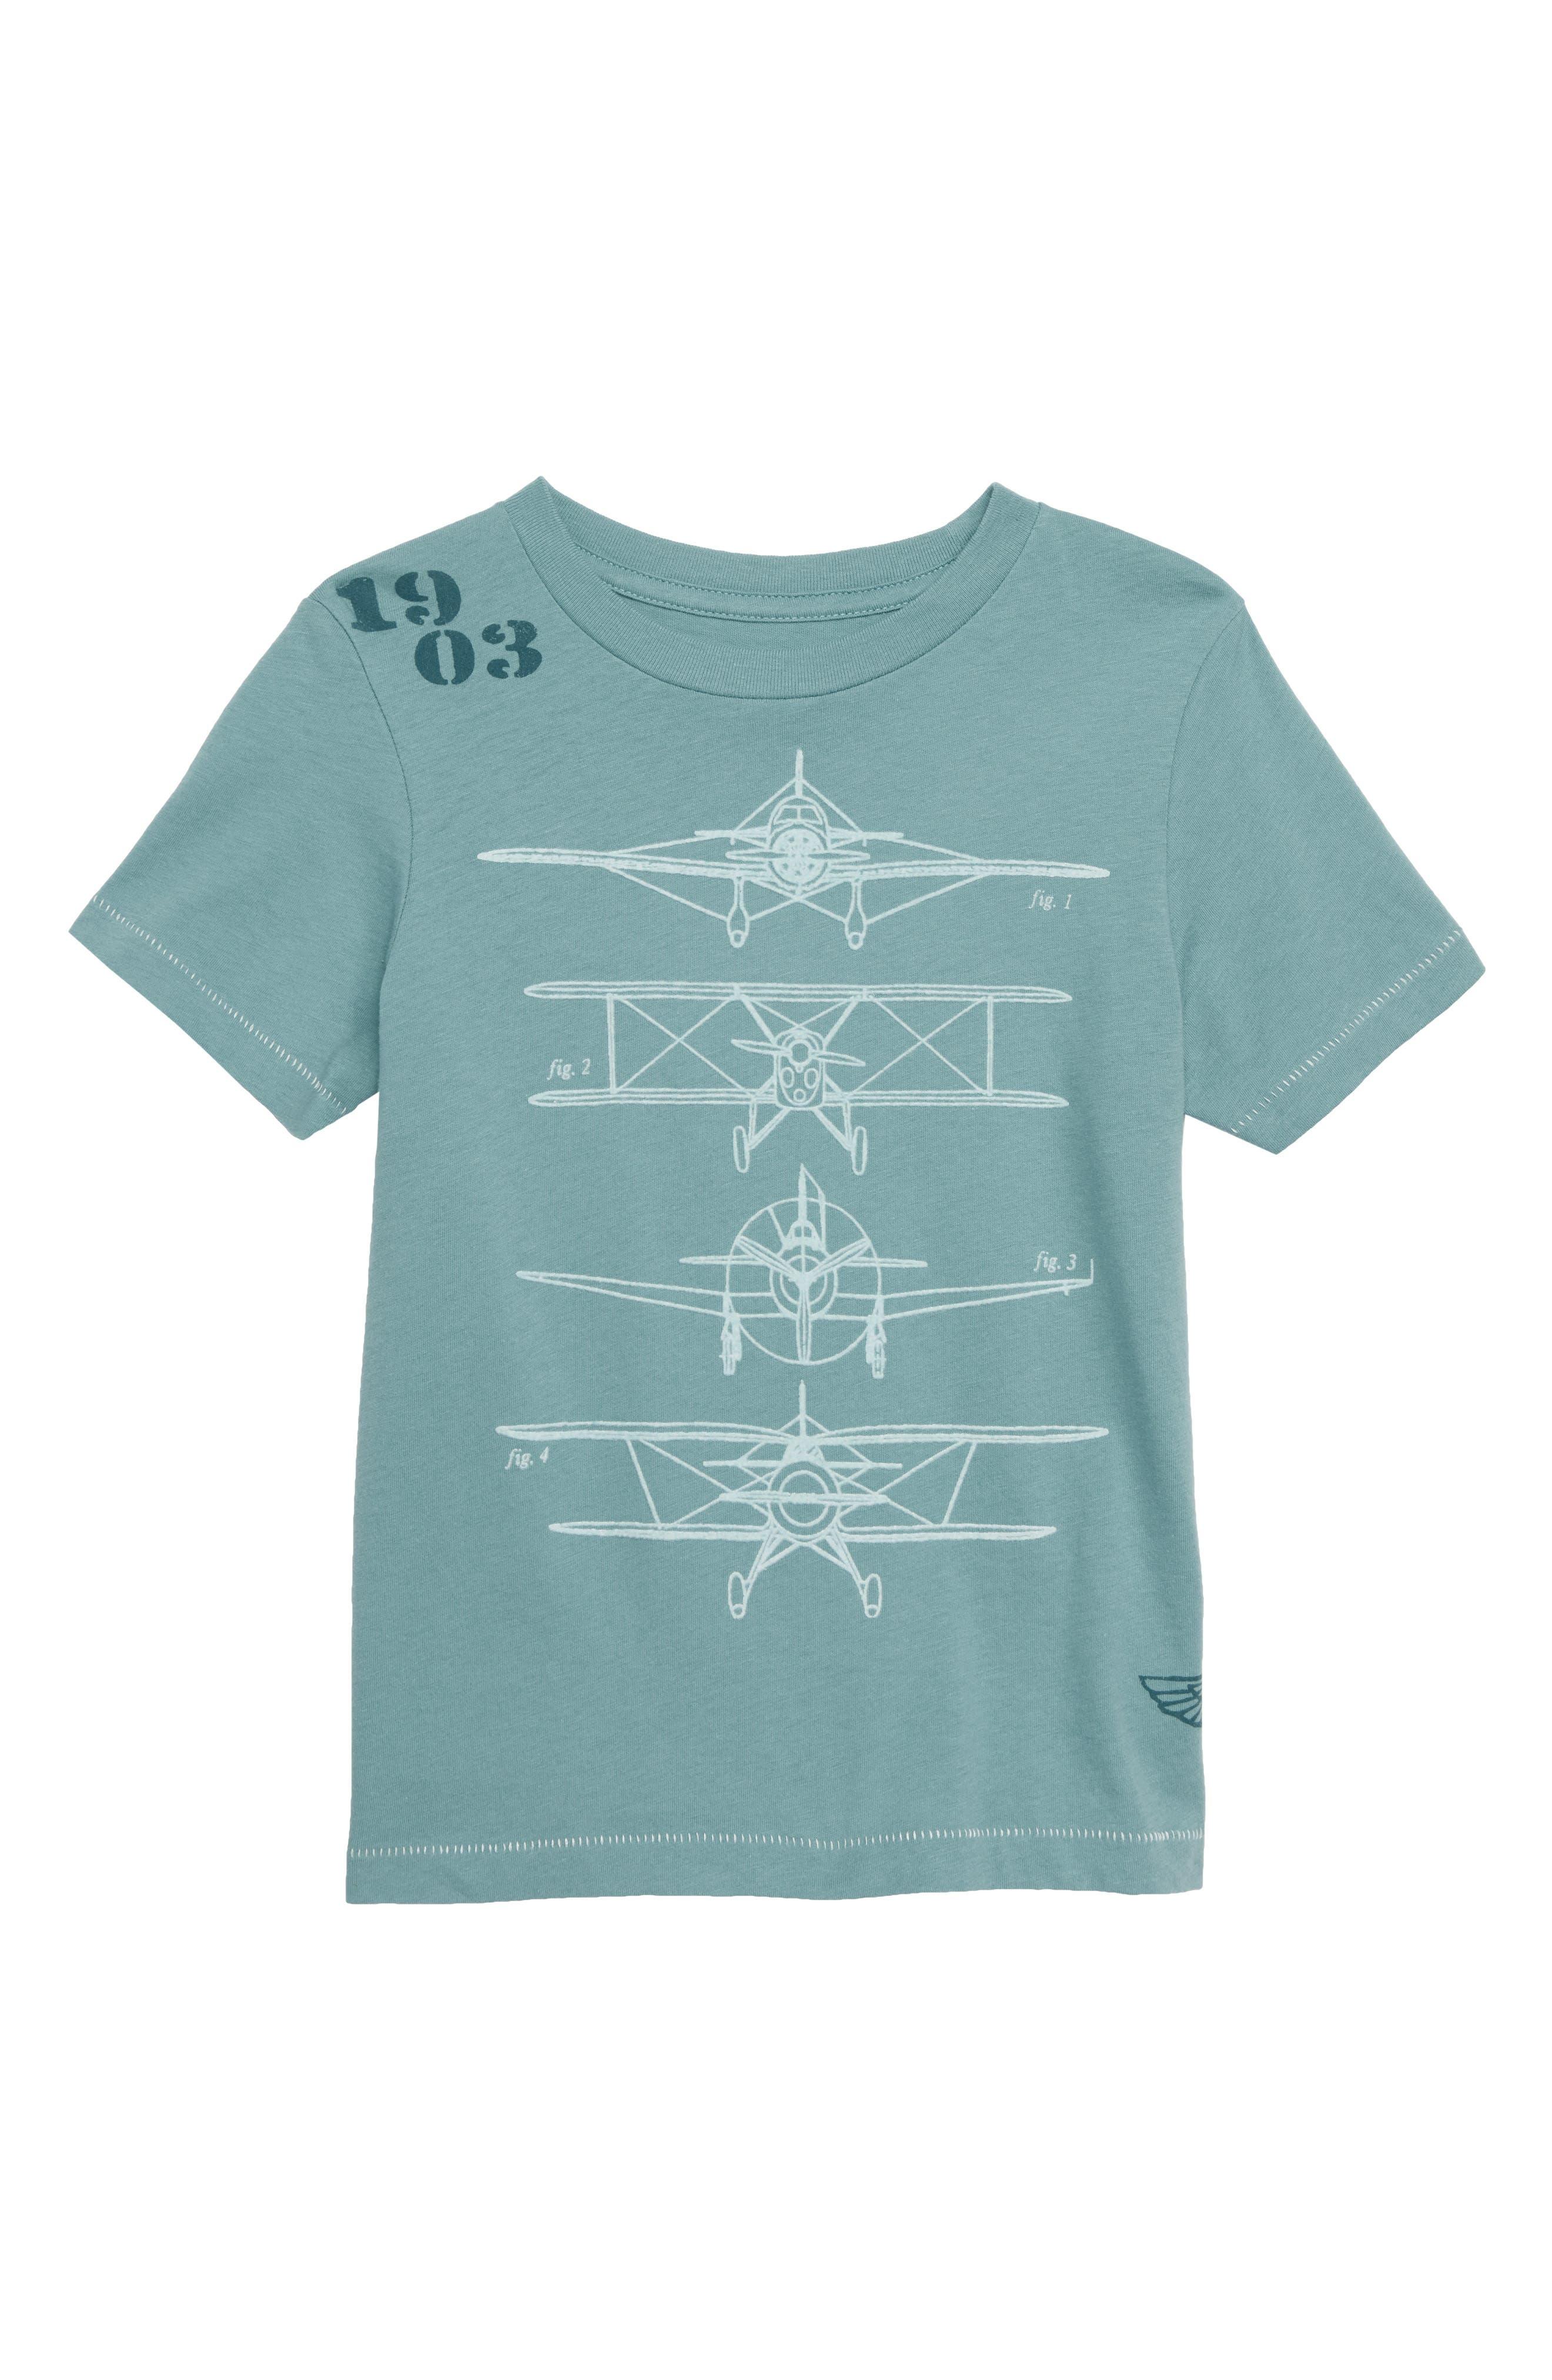 Airplane Graphic T-Shirt,                             Main thumbnail 1, color,                             MARINE BLUE